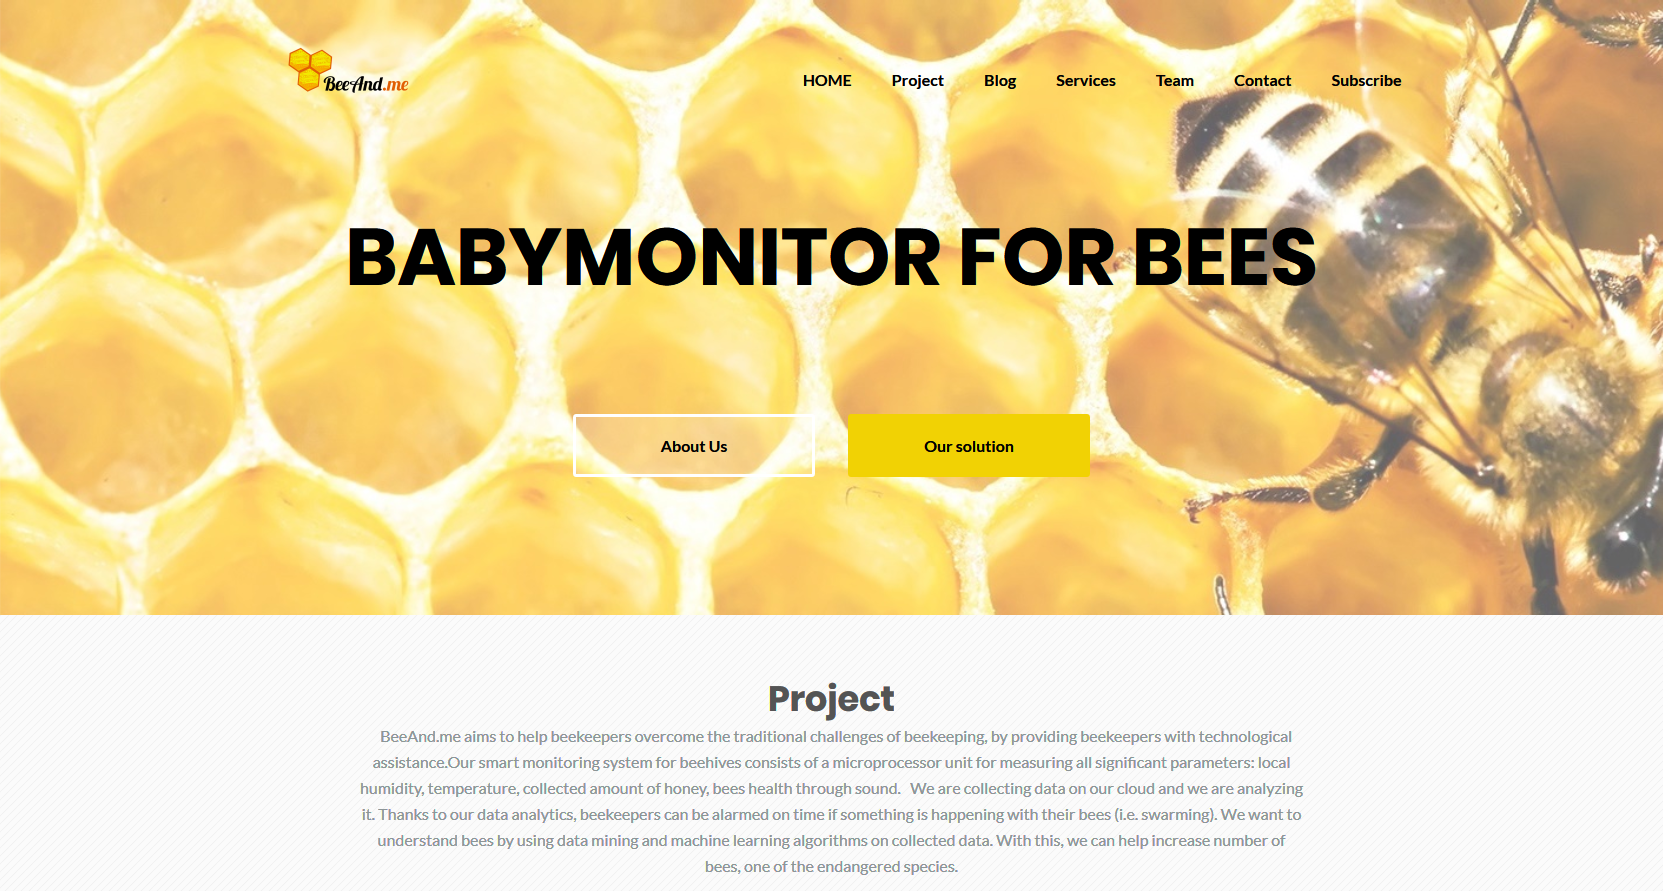 BeeAndMe - Web